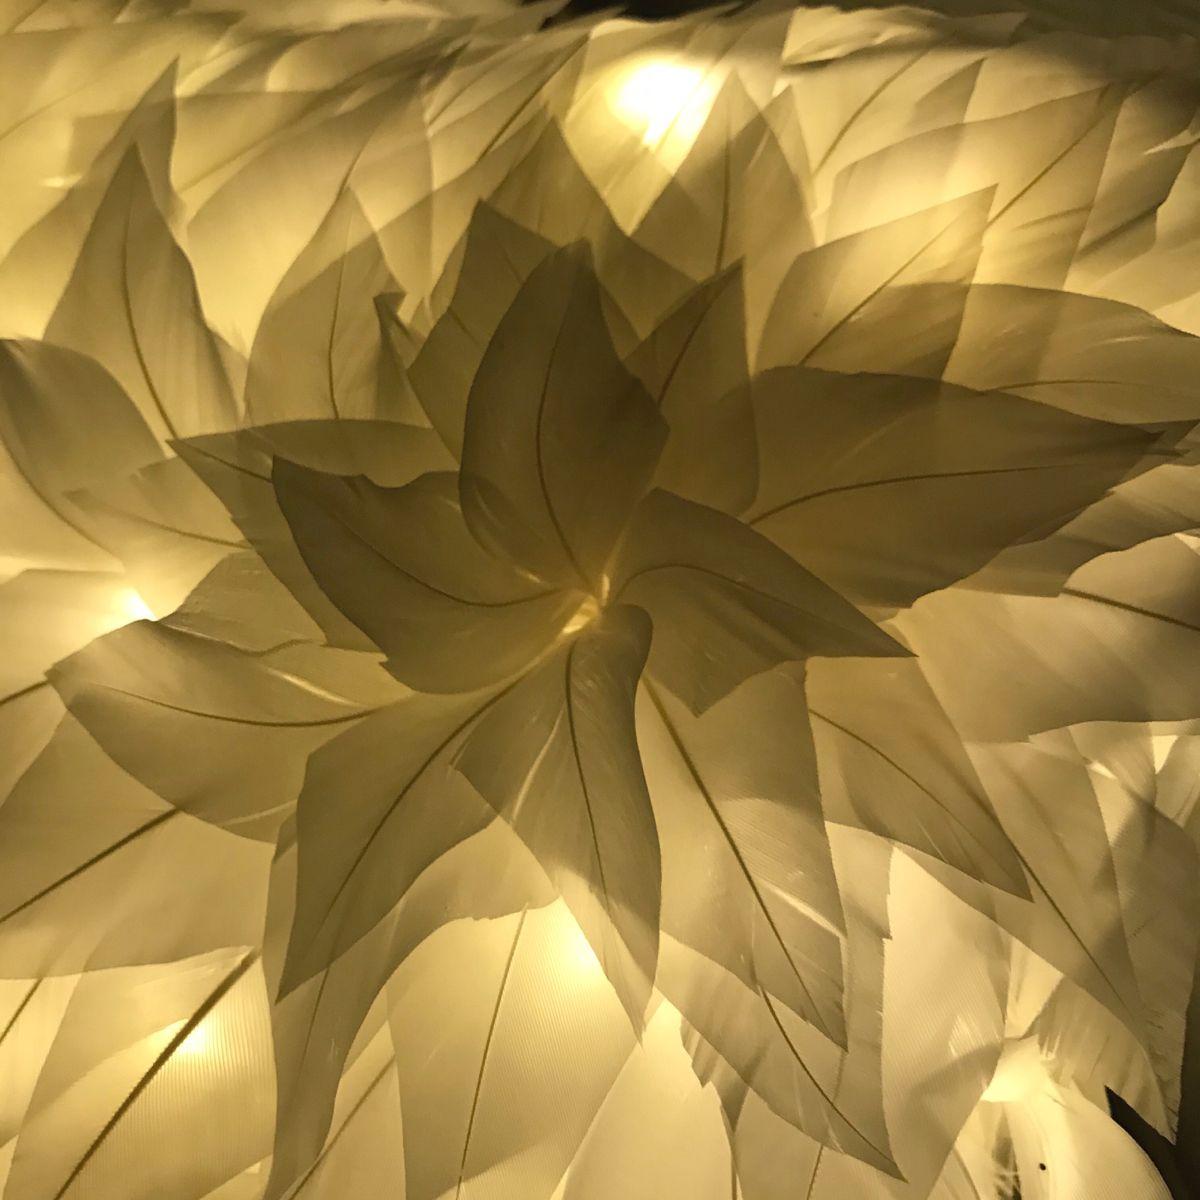 #angel #feather #whitehome. #whiteinterior #scenography #lampshade #appliques #plumasserie #clairdejourpariscreation #whitefeather #instagram #instapic #instaphoto #instahome #instadesign #fabriqueaparis #madeinfrance🇫🇷 #madeineurope #madeinlove #parisjetaime #lavieestbelle